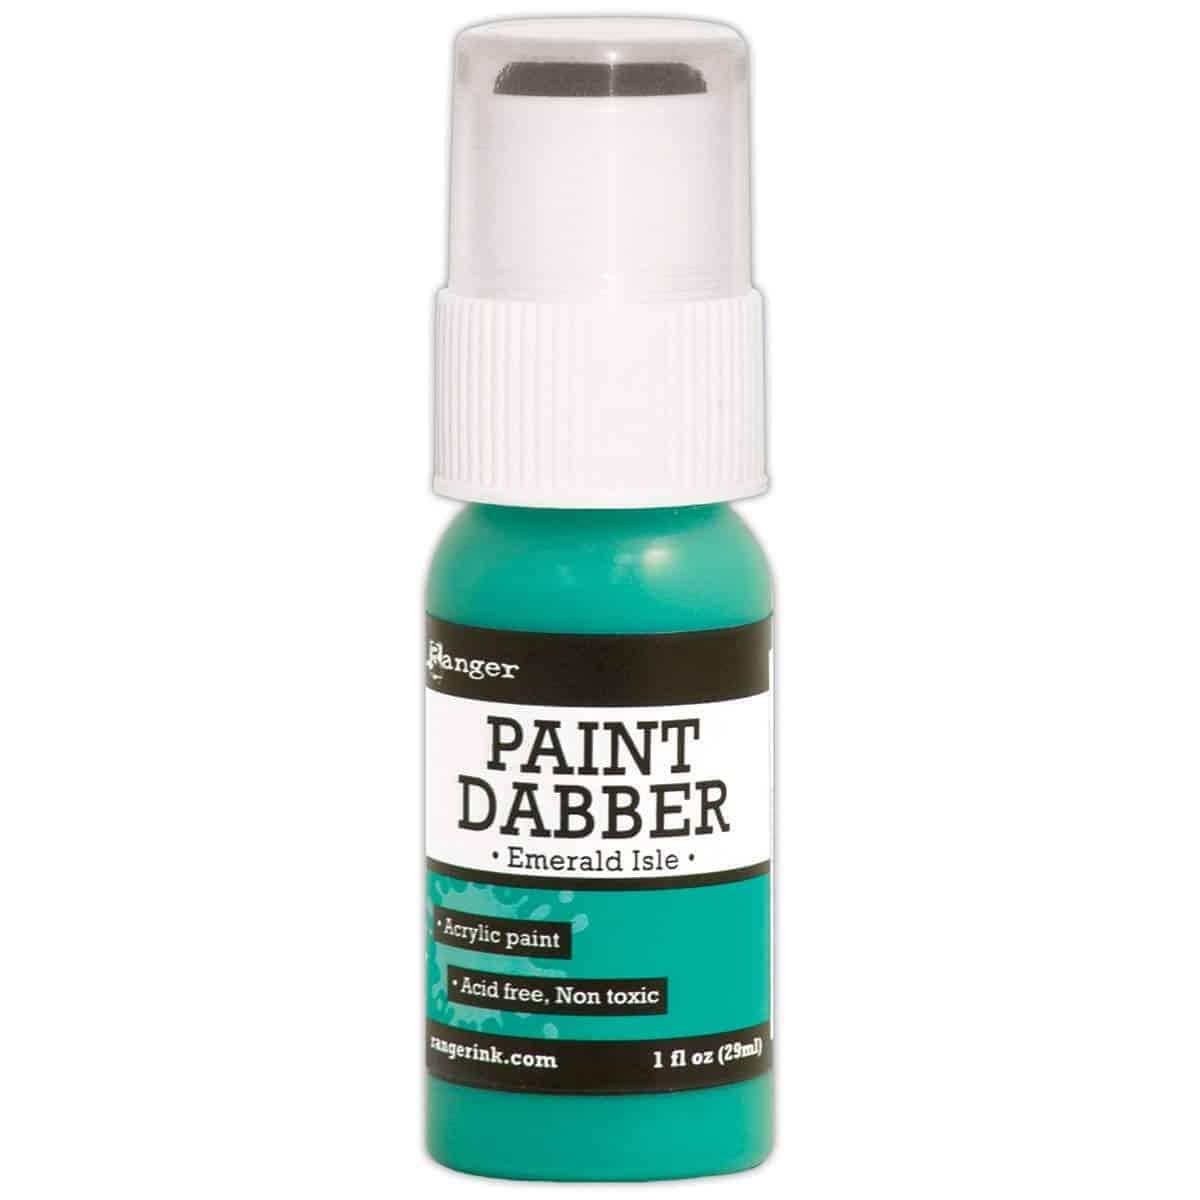 Acrylic Paint Dabber - Ranger